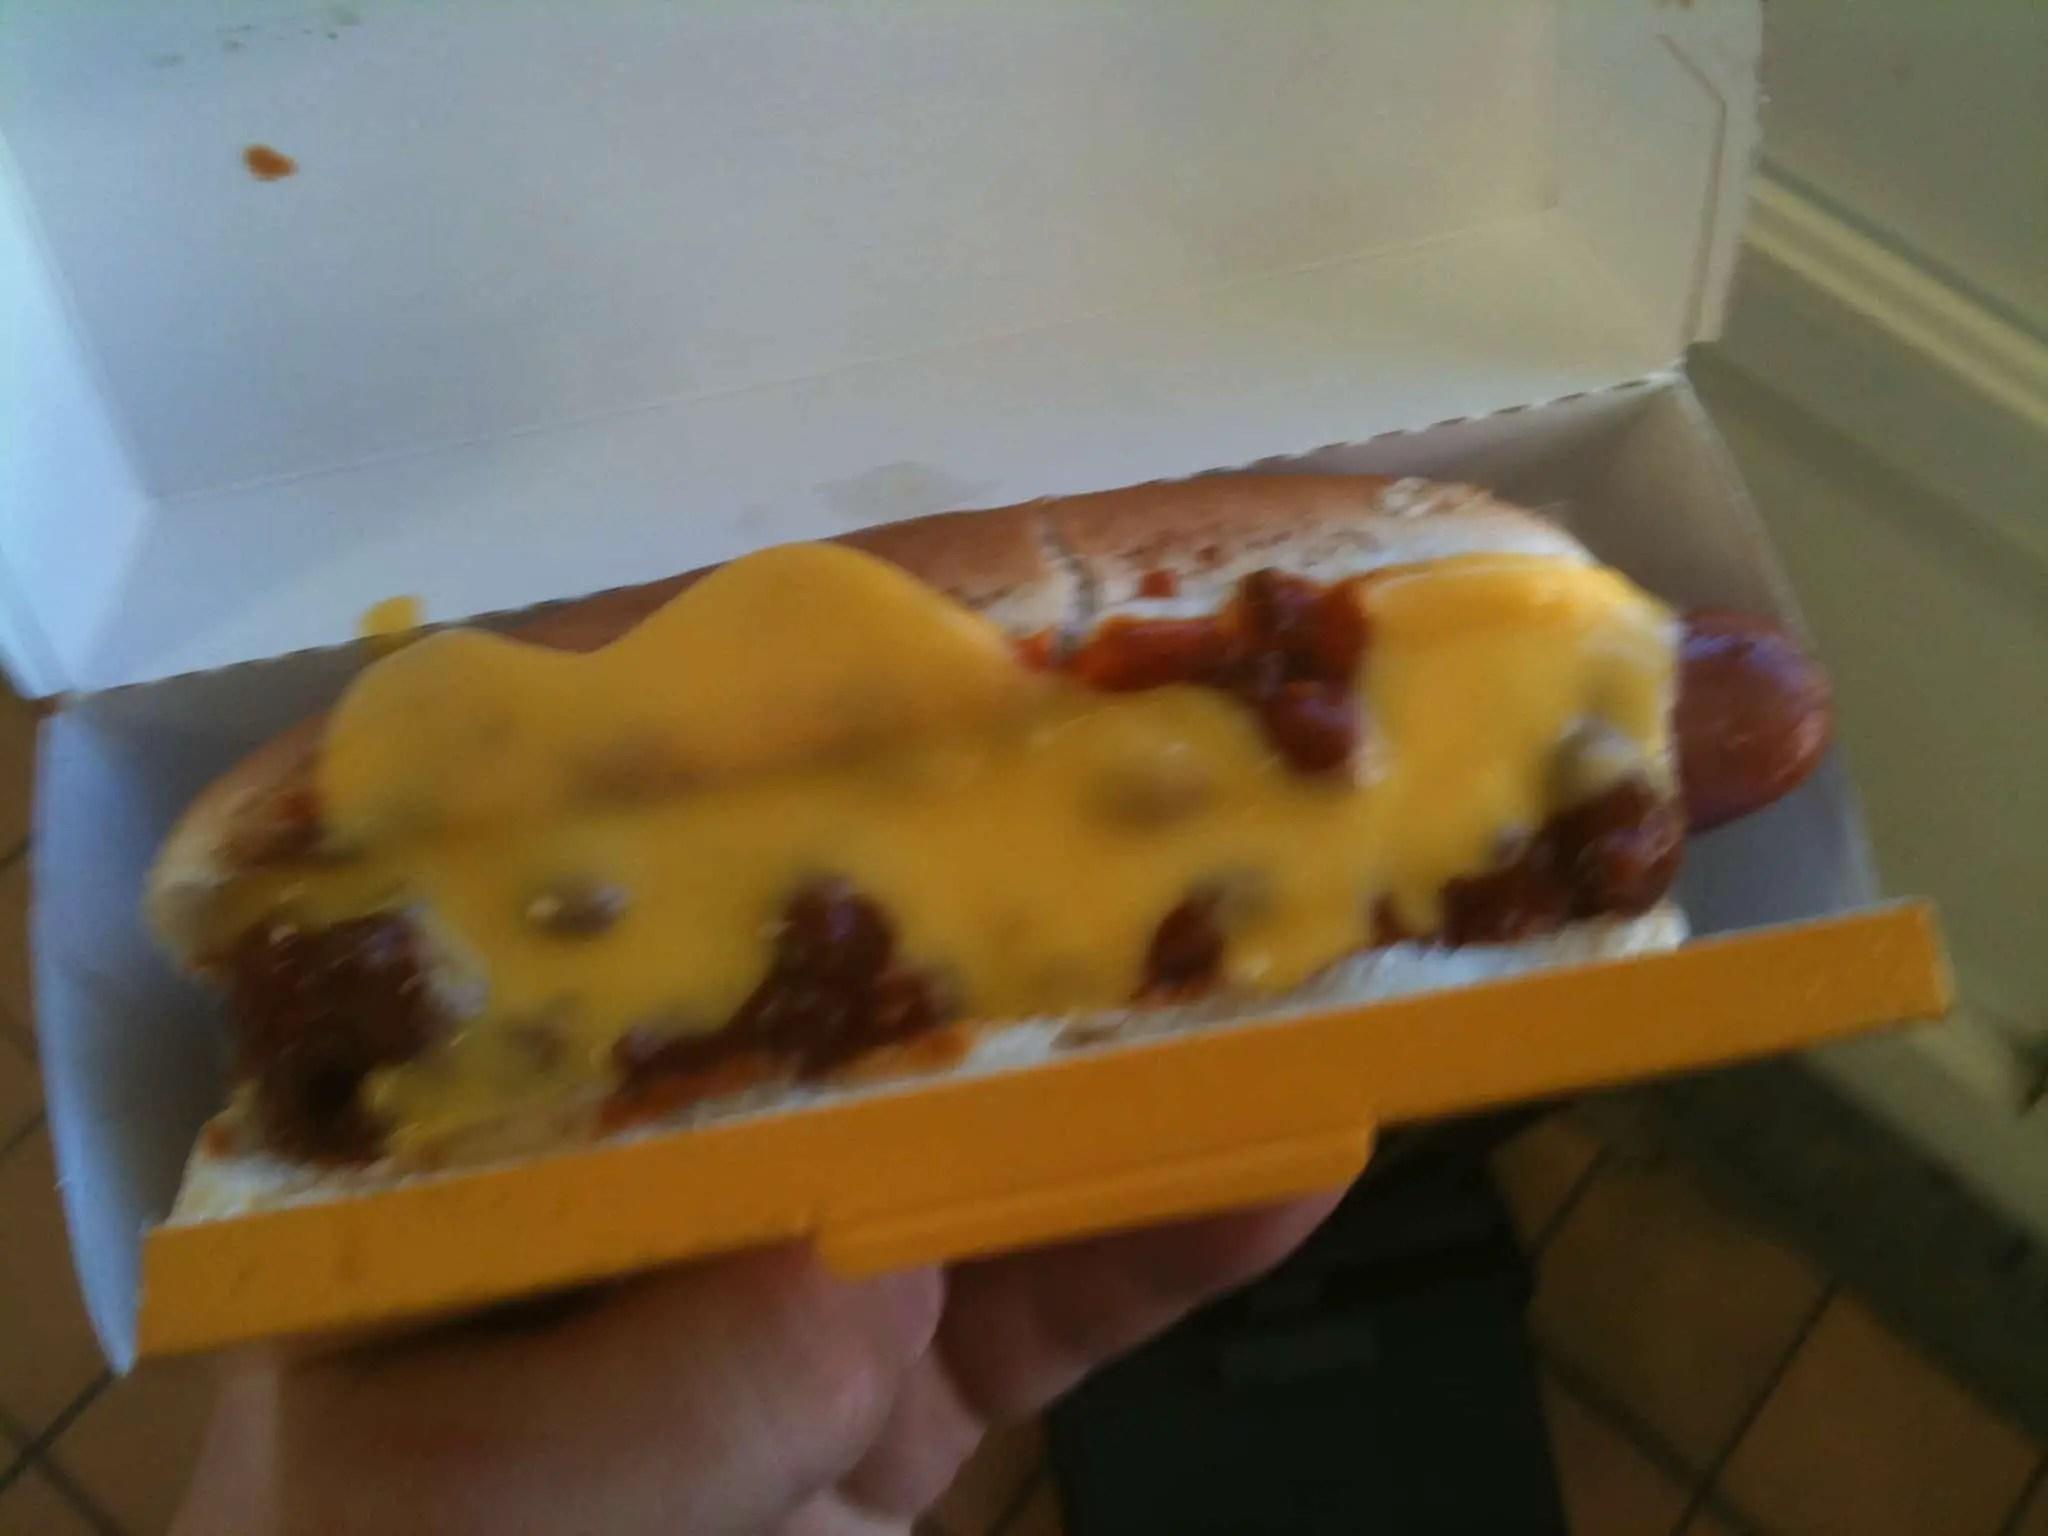 Where Did Nathan Hot Dog Originate